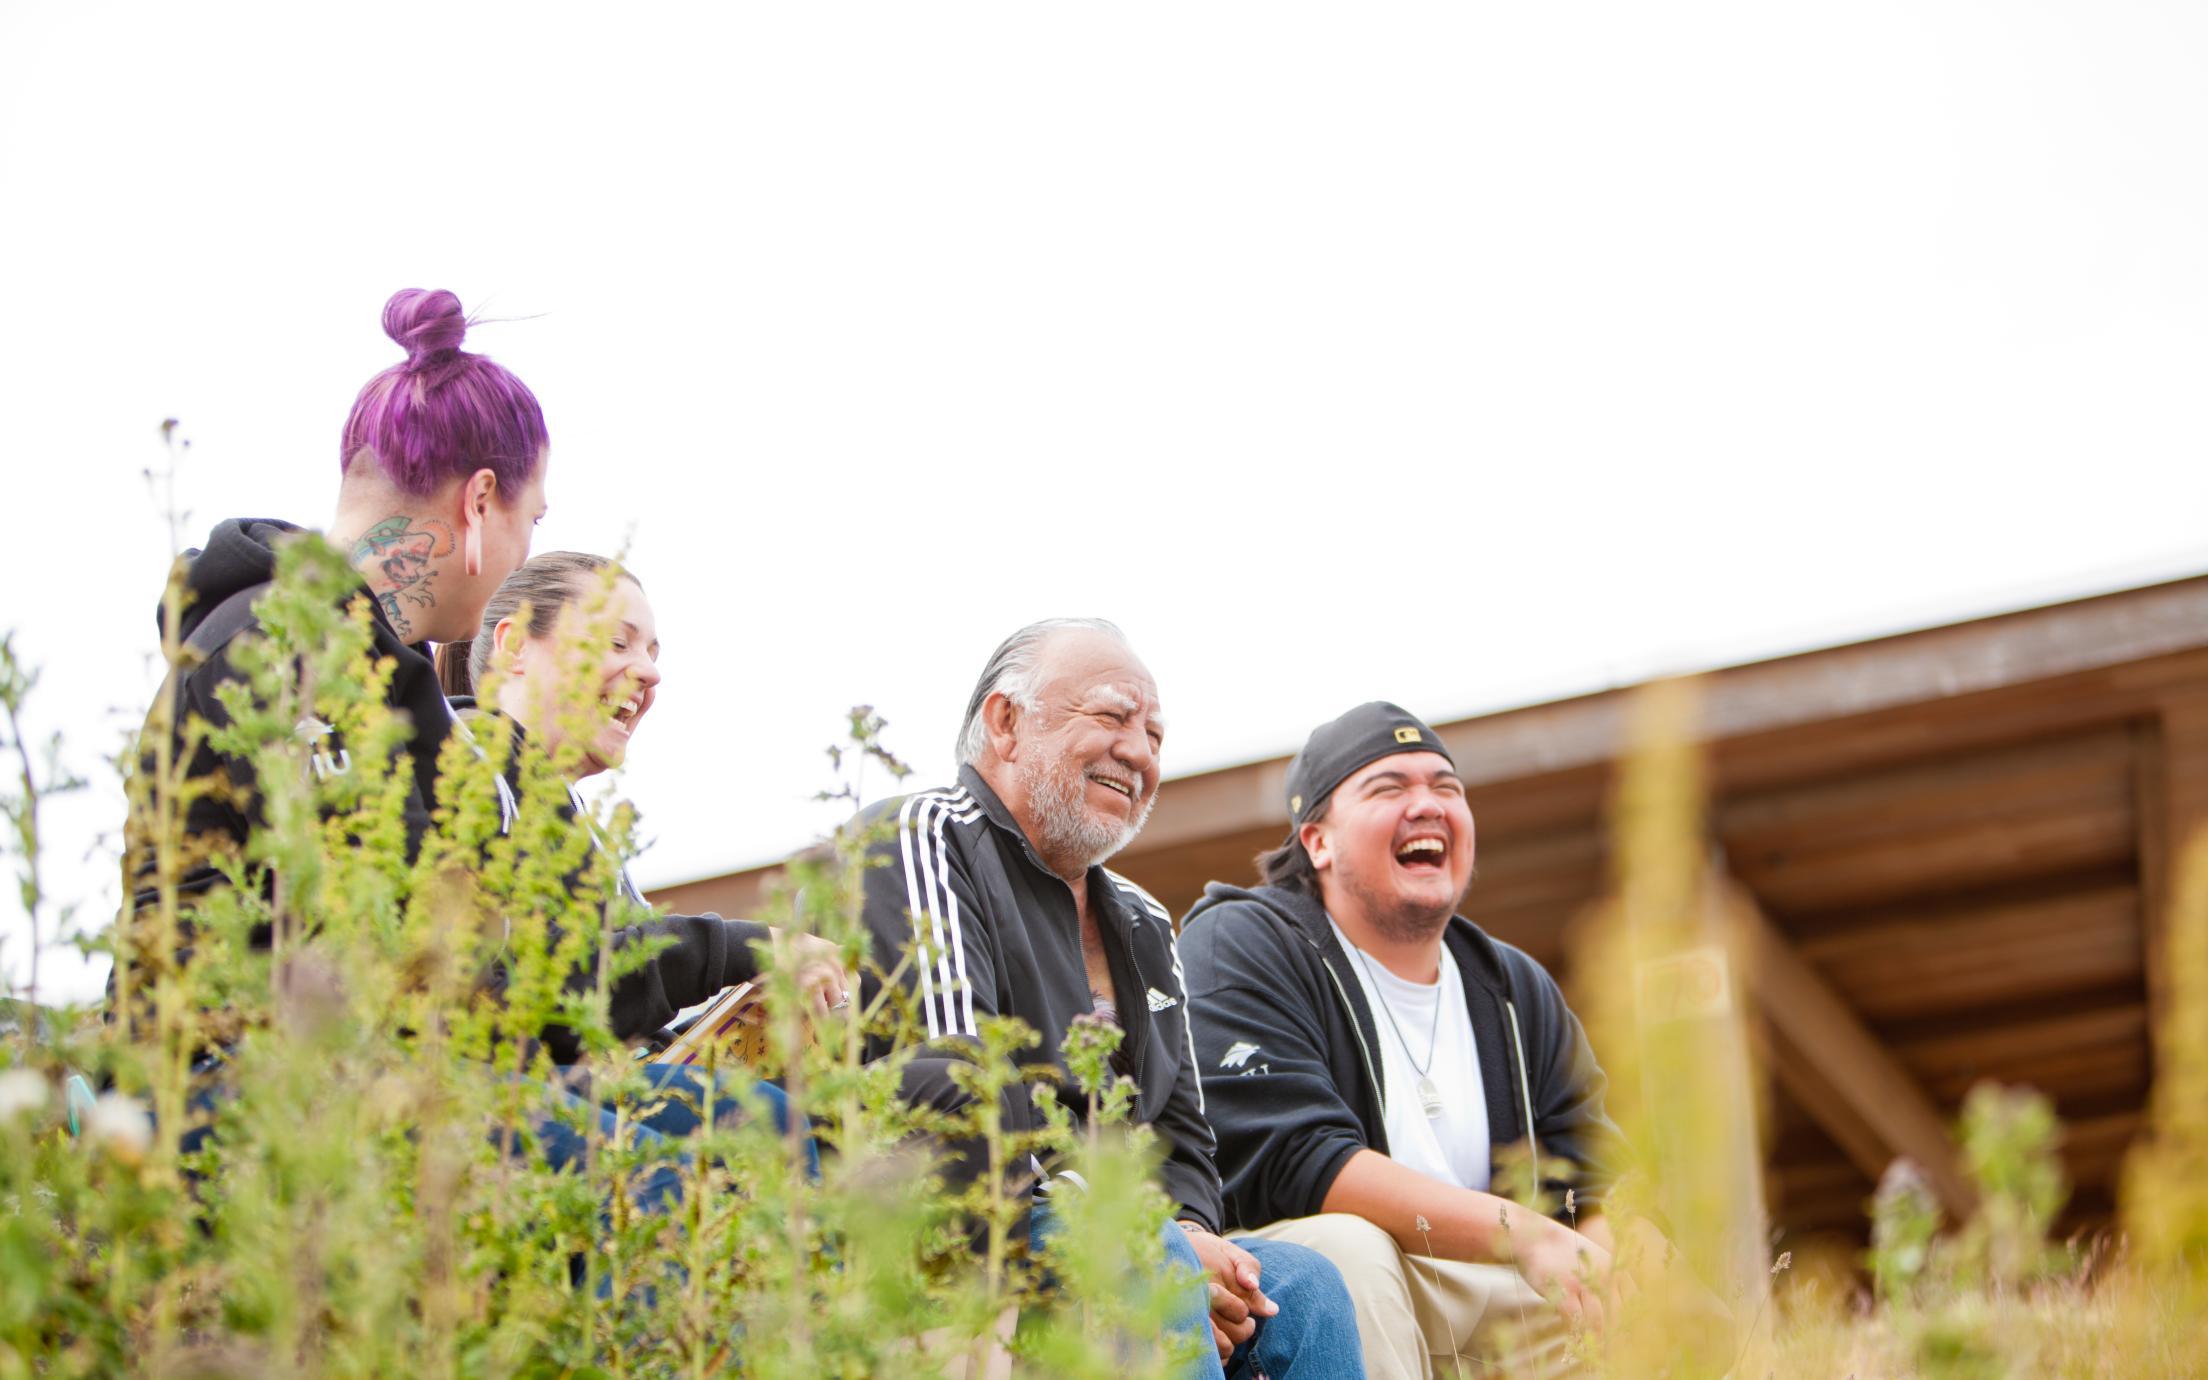 Surviving University as an Indigenous Student